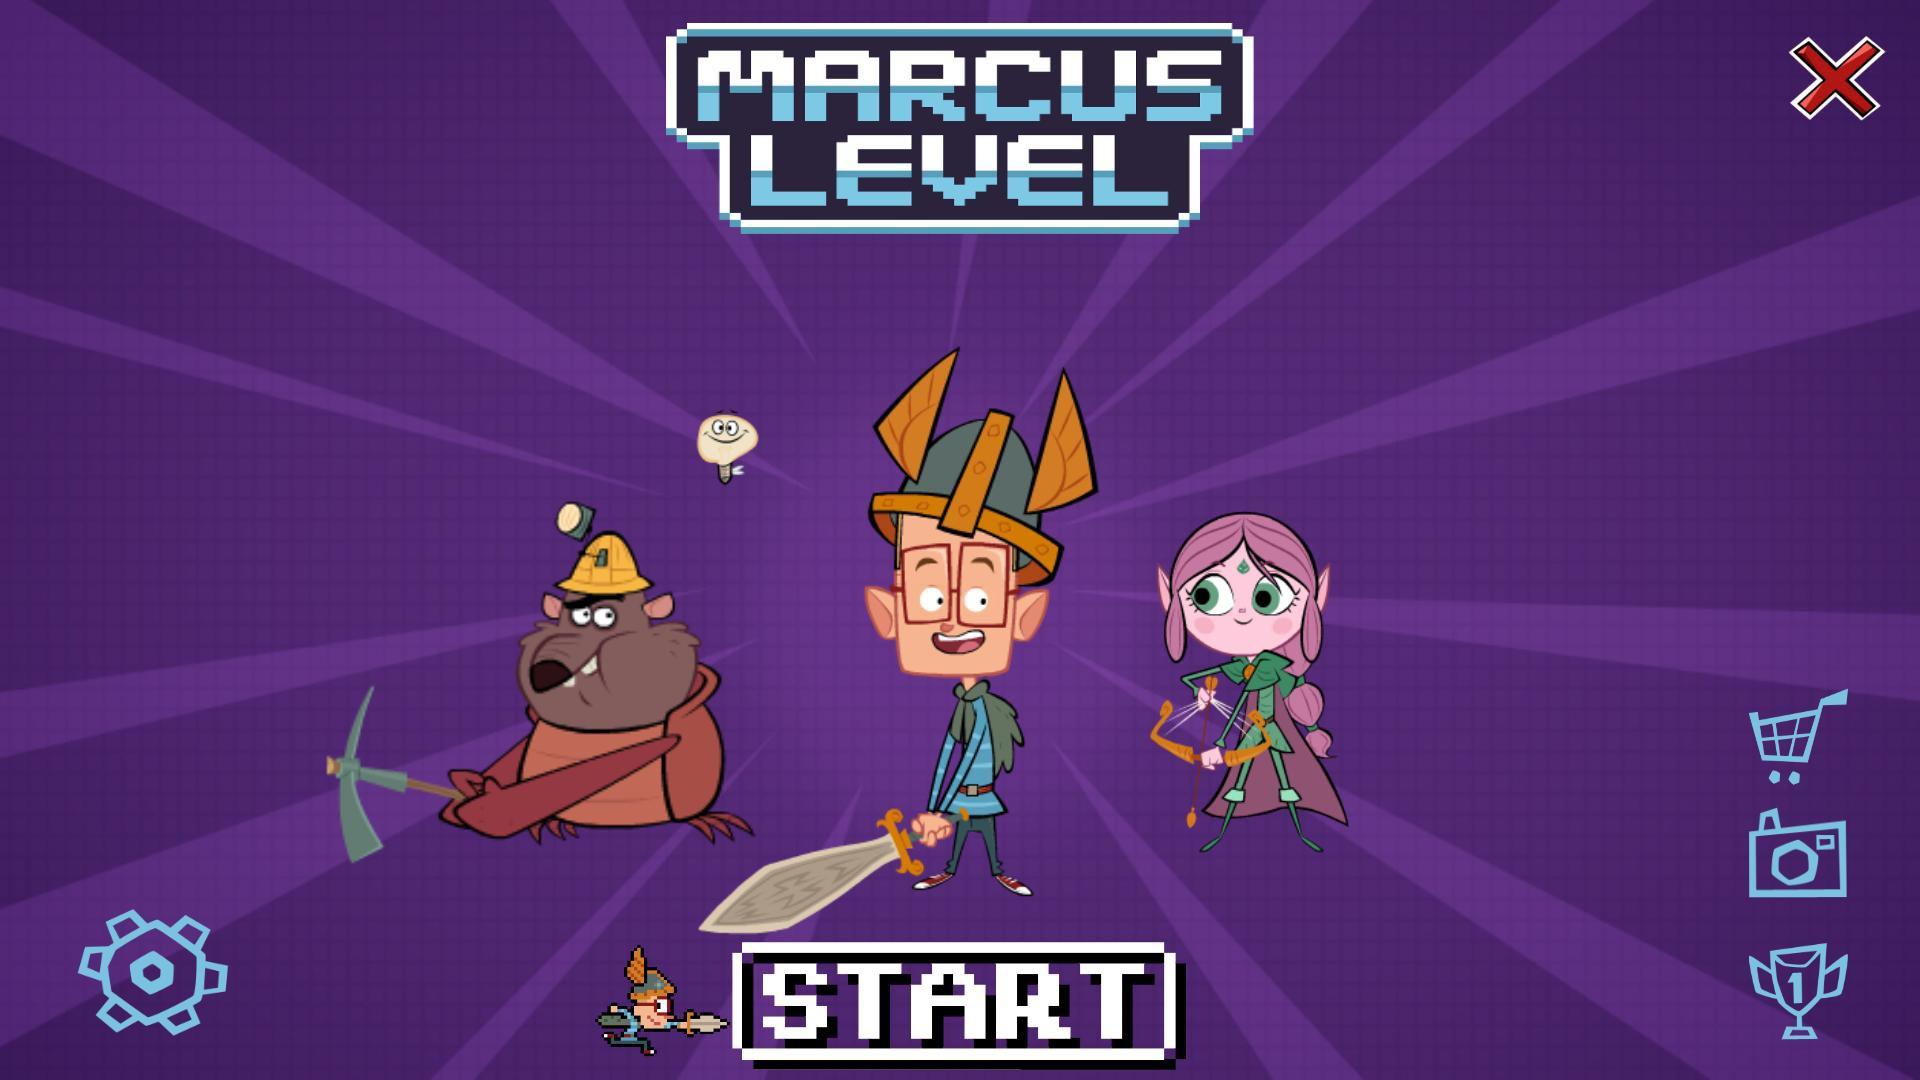 Marcus Level Multi4 (En)